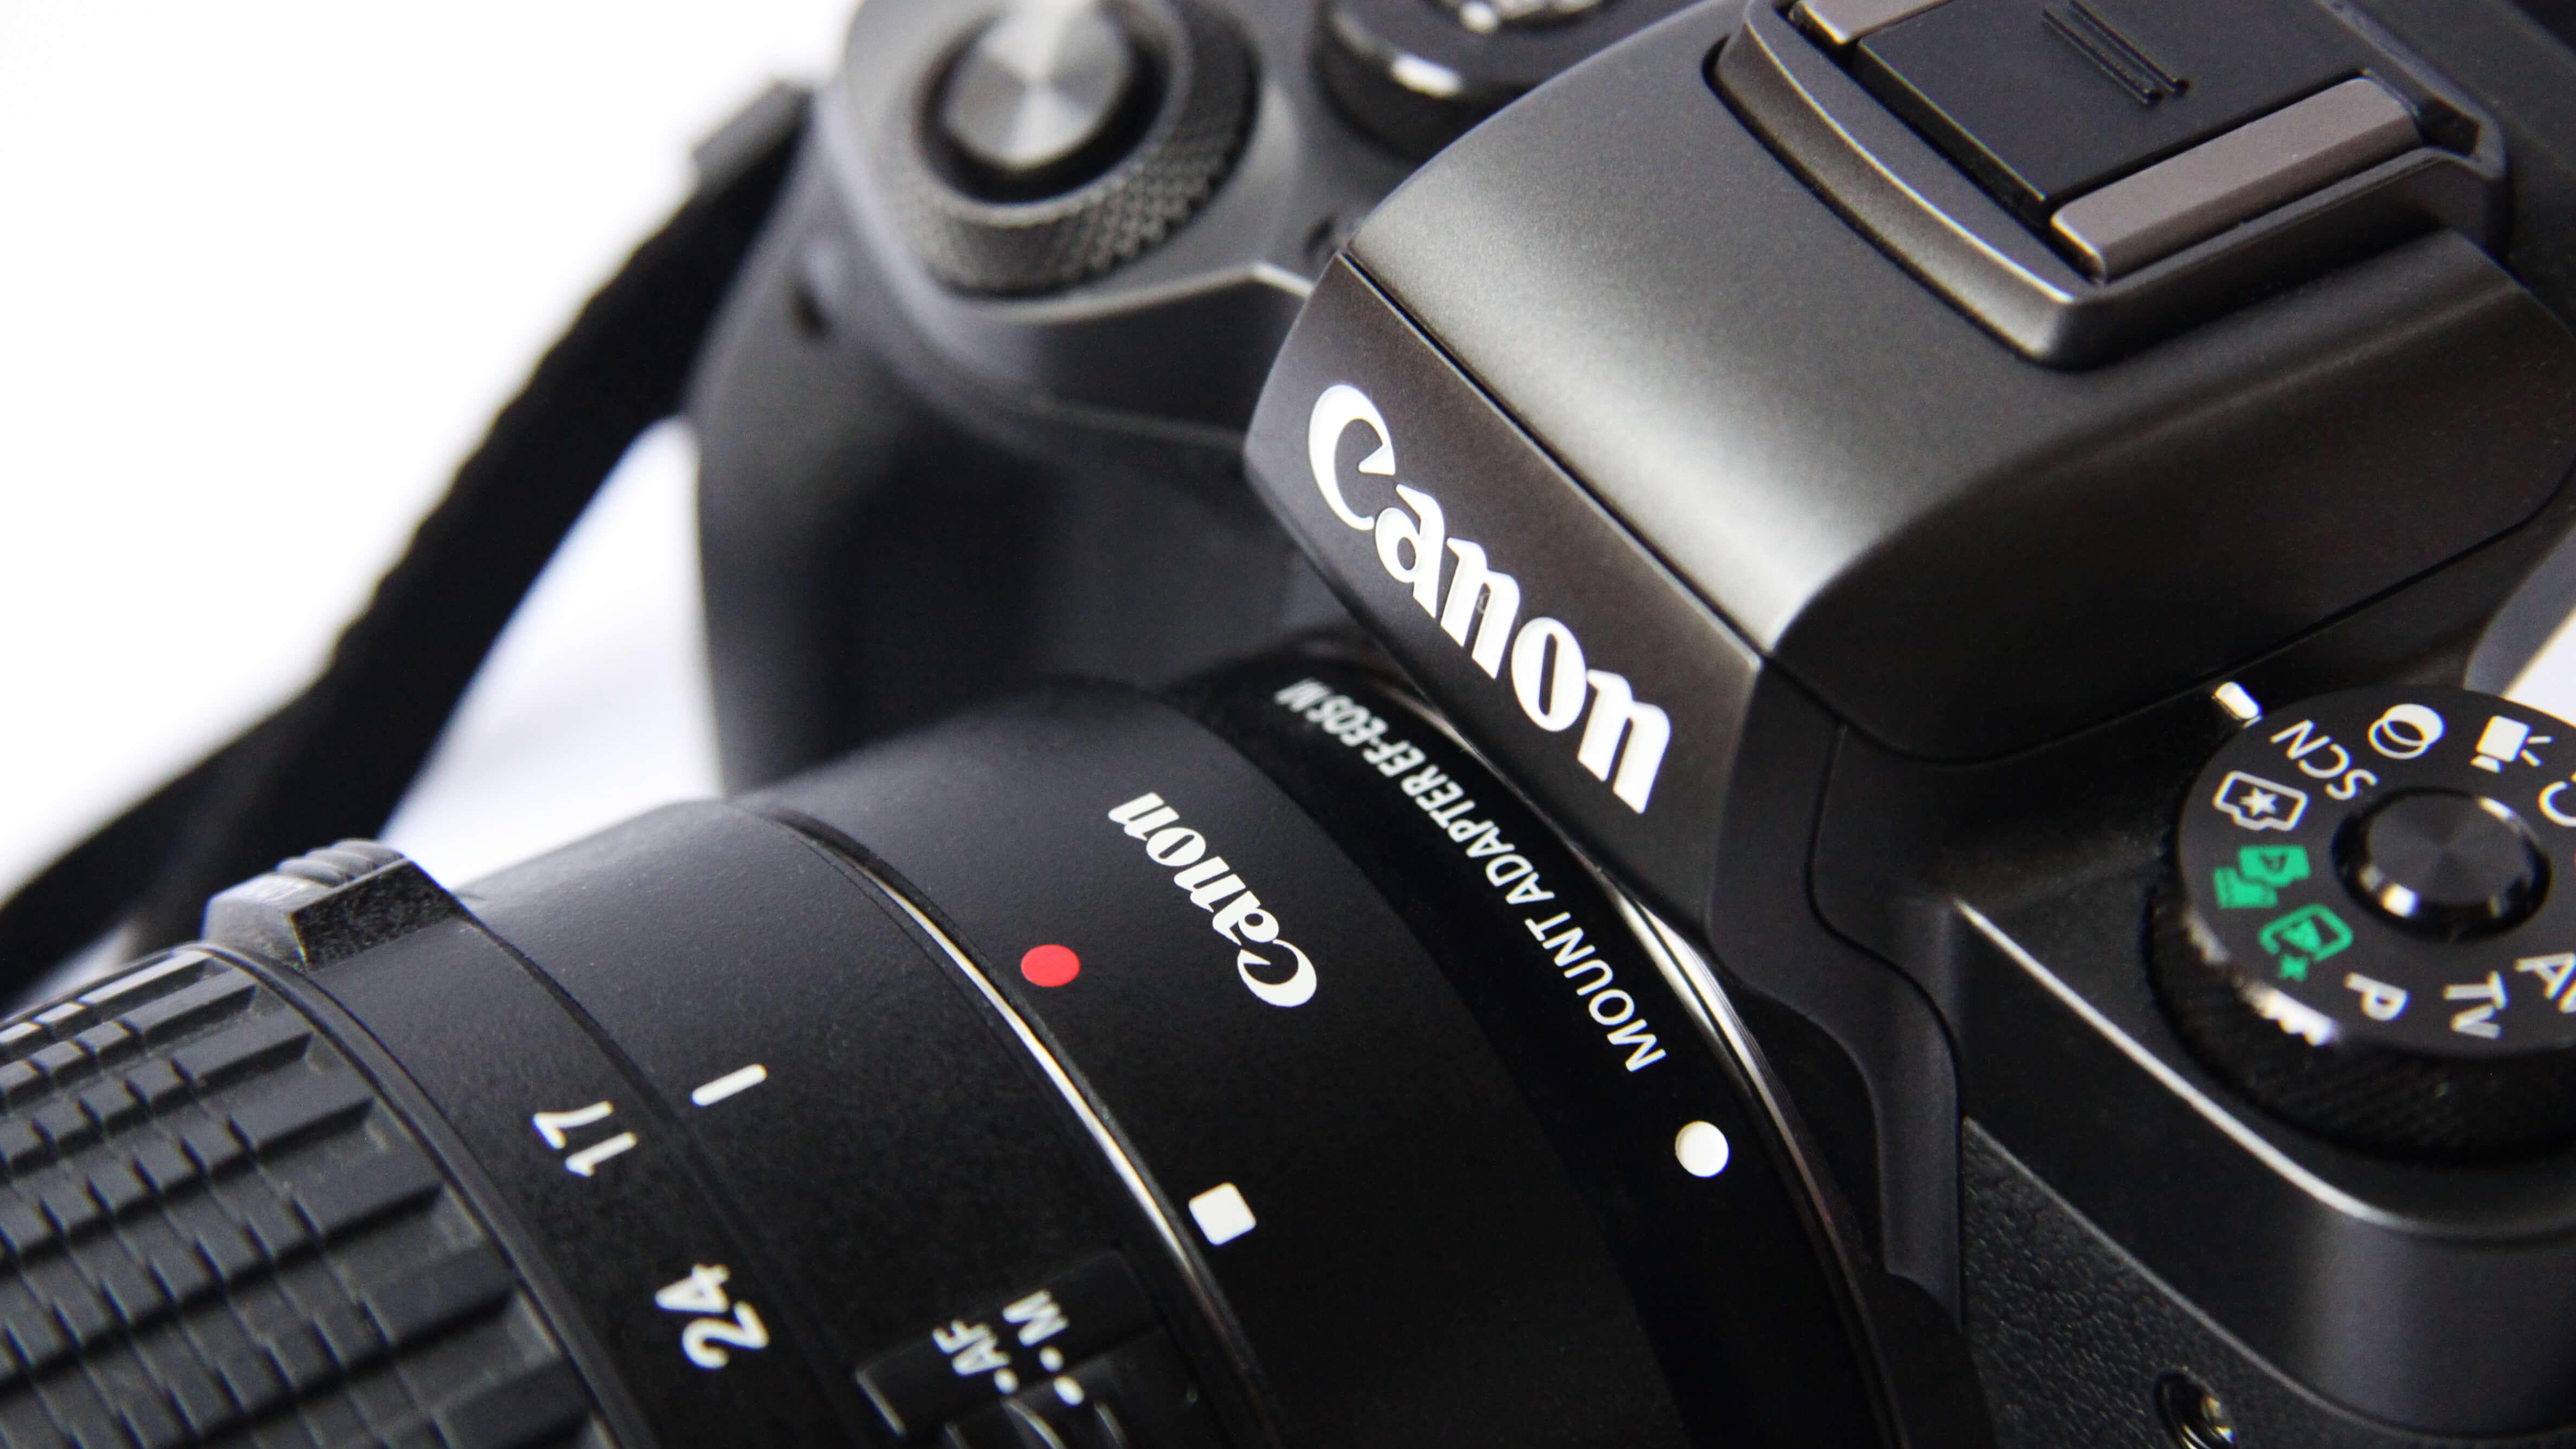 Canon 7D Mark II Review: A Photographer's Lifelong Companion